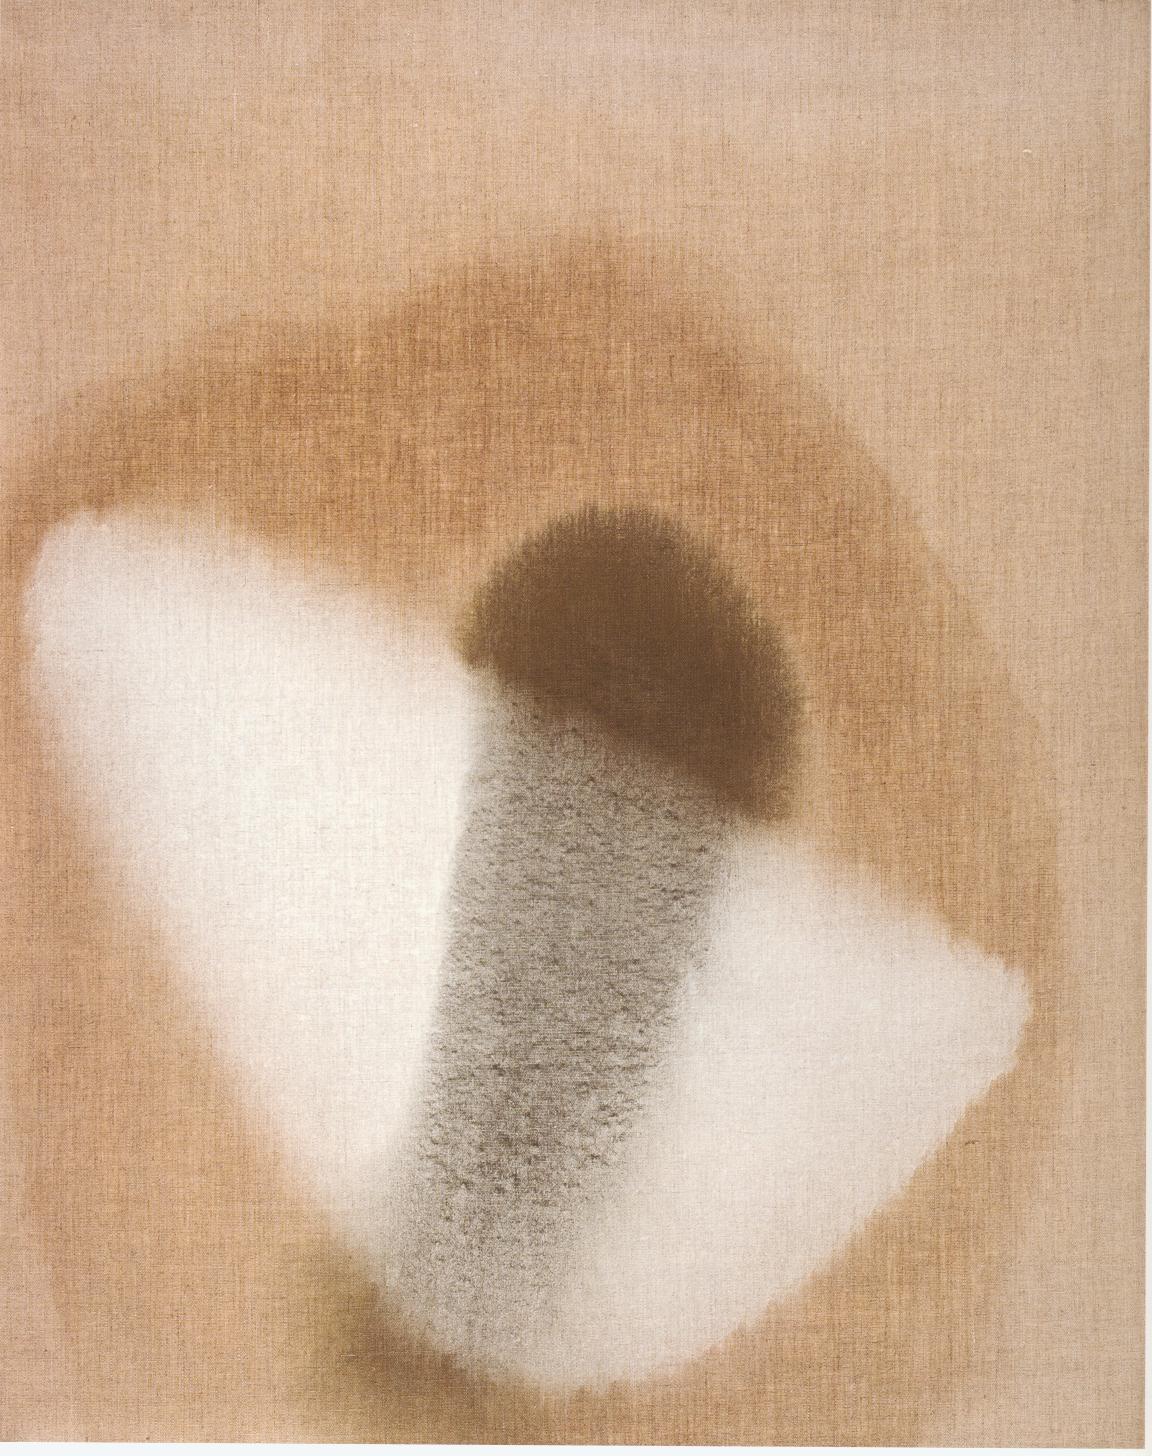 6 aprile, 2008, olio su tela, cm 110 x 90  6 aprile, 2008, oil on canvas, cm 110 x 90